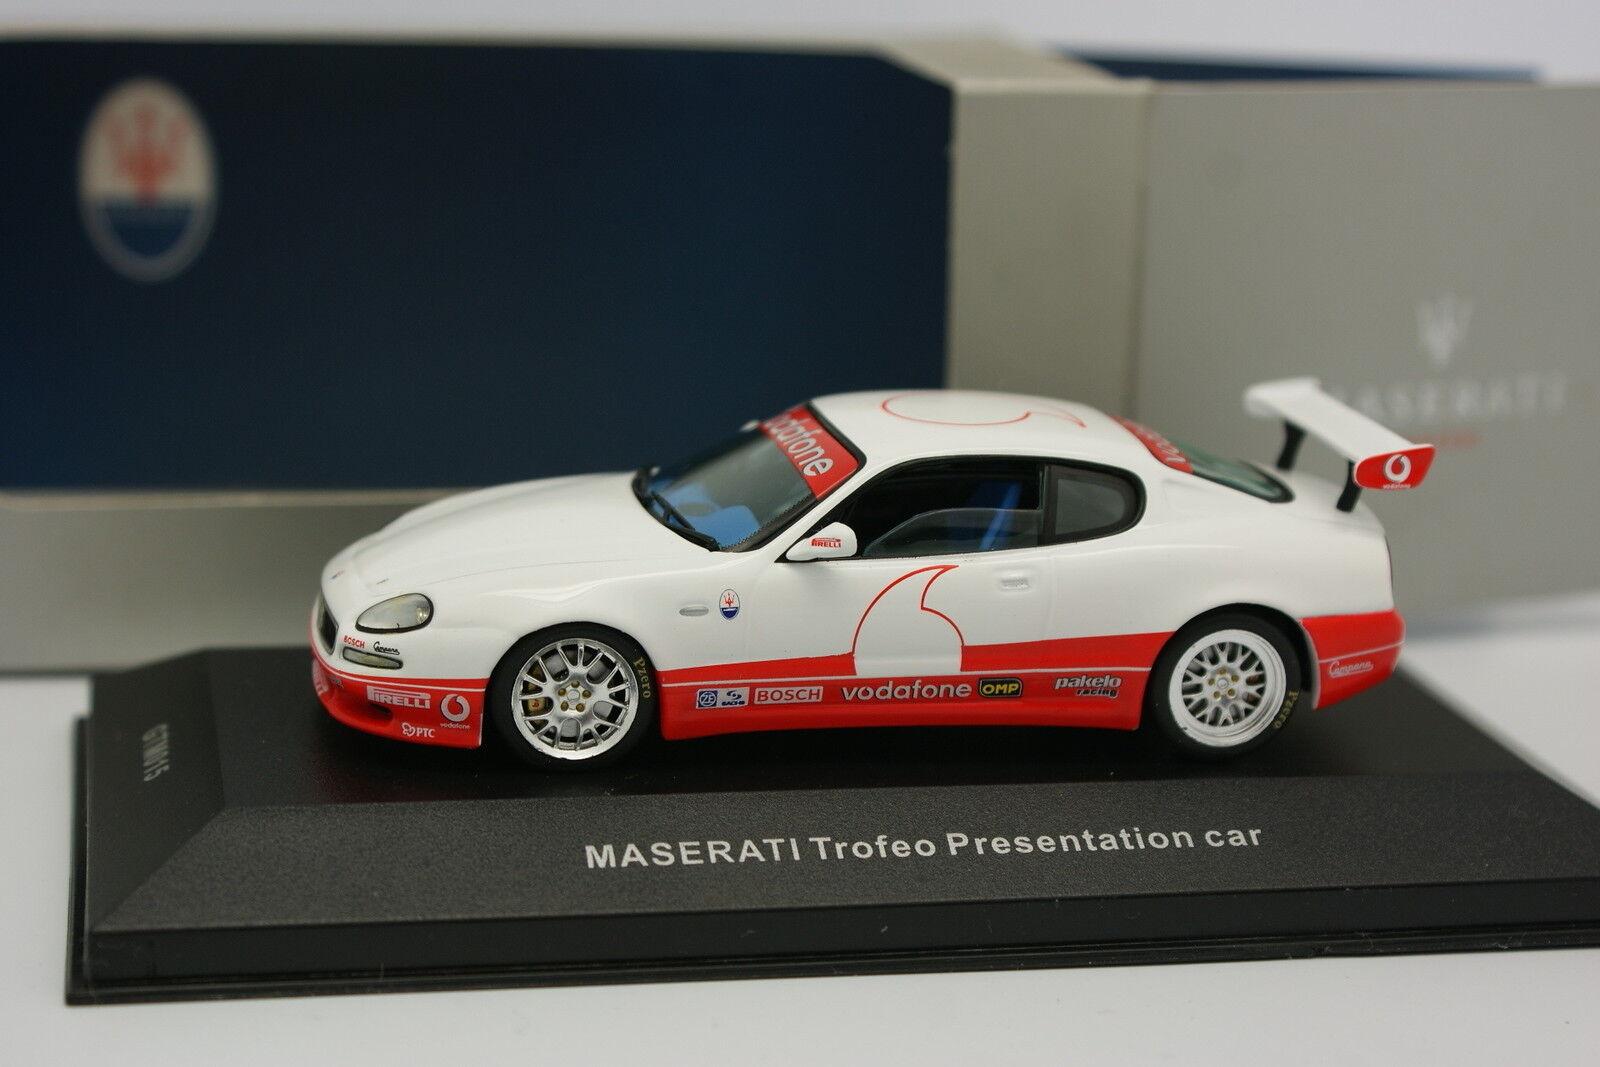 IXO 1 43 - Maserati presentation car